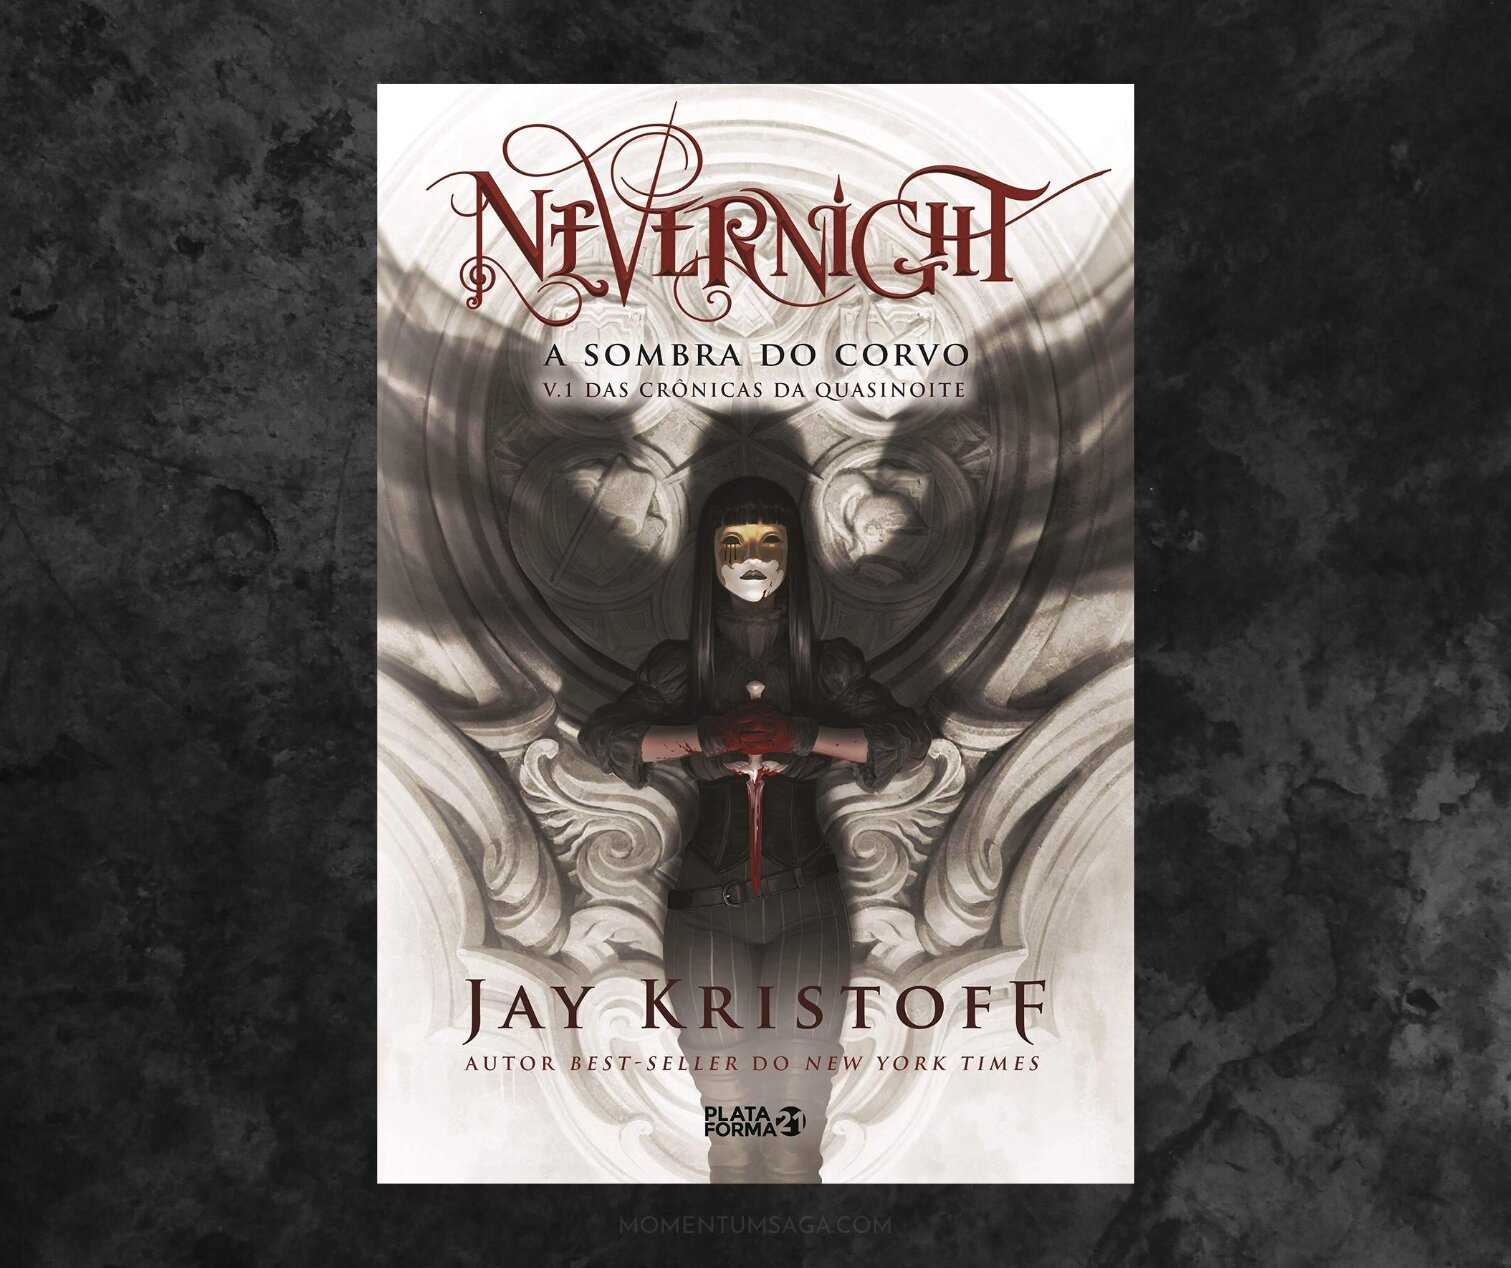 Resenha: Nevernight, a Sombra do Corvo, de Jay Kristoff